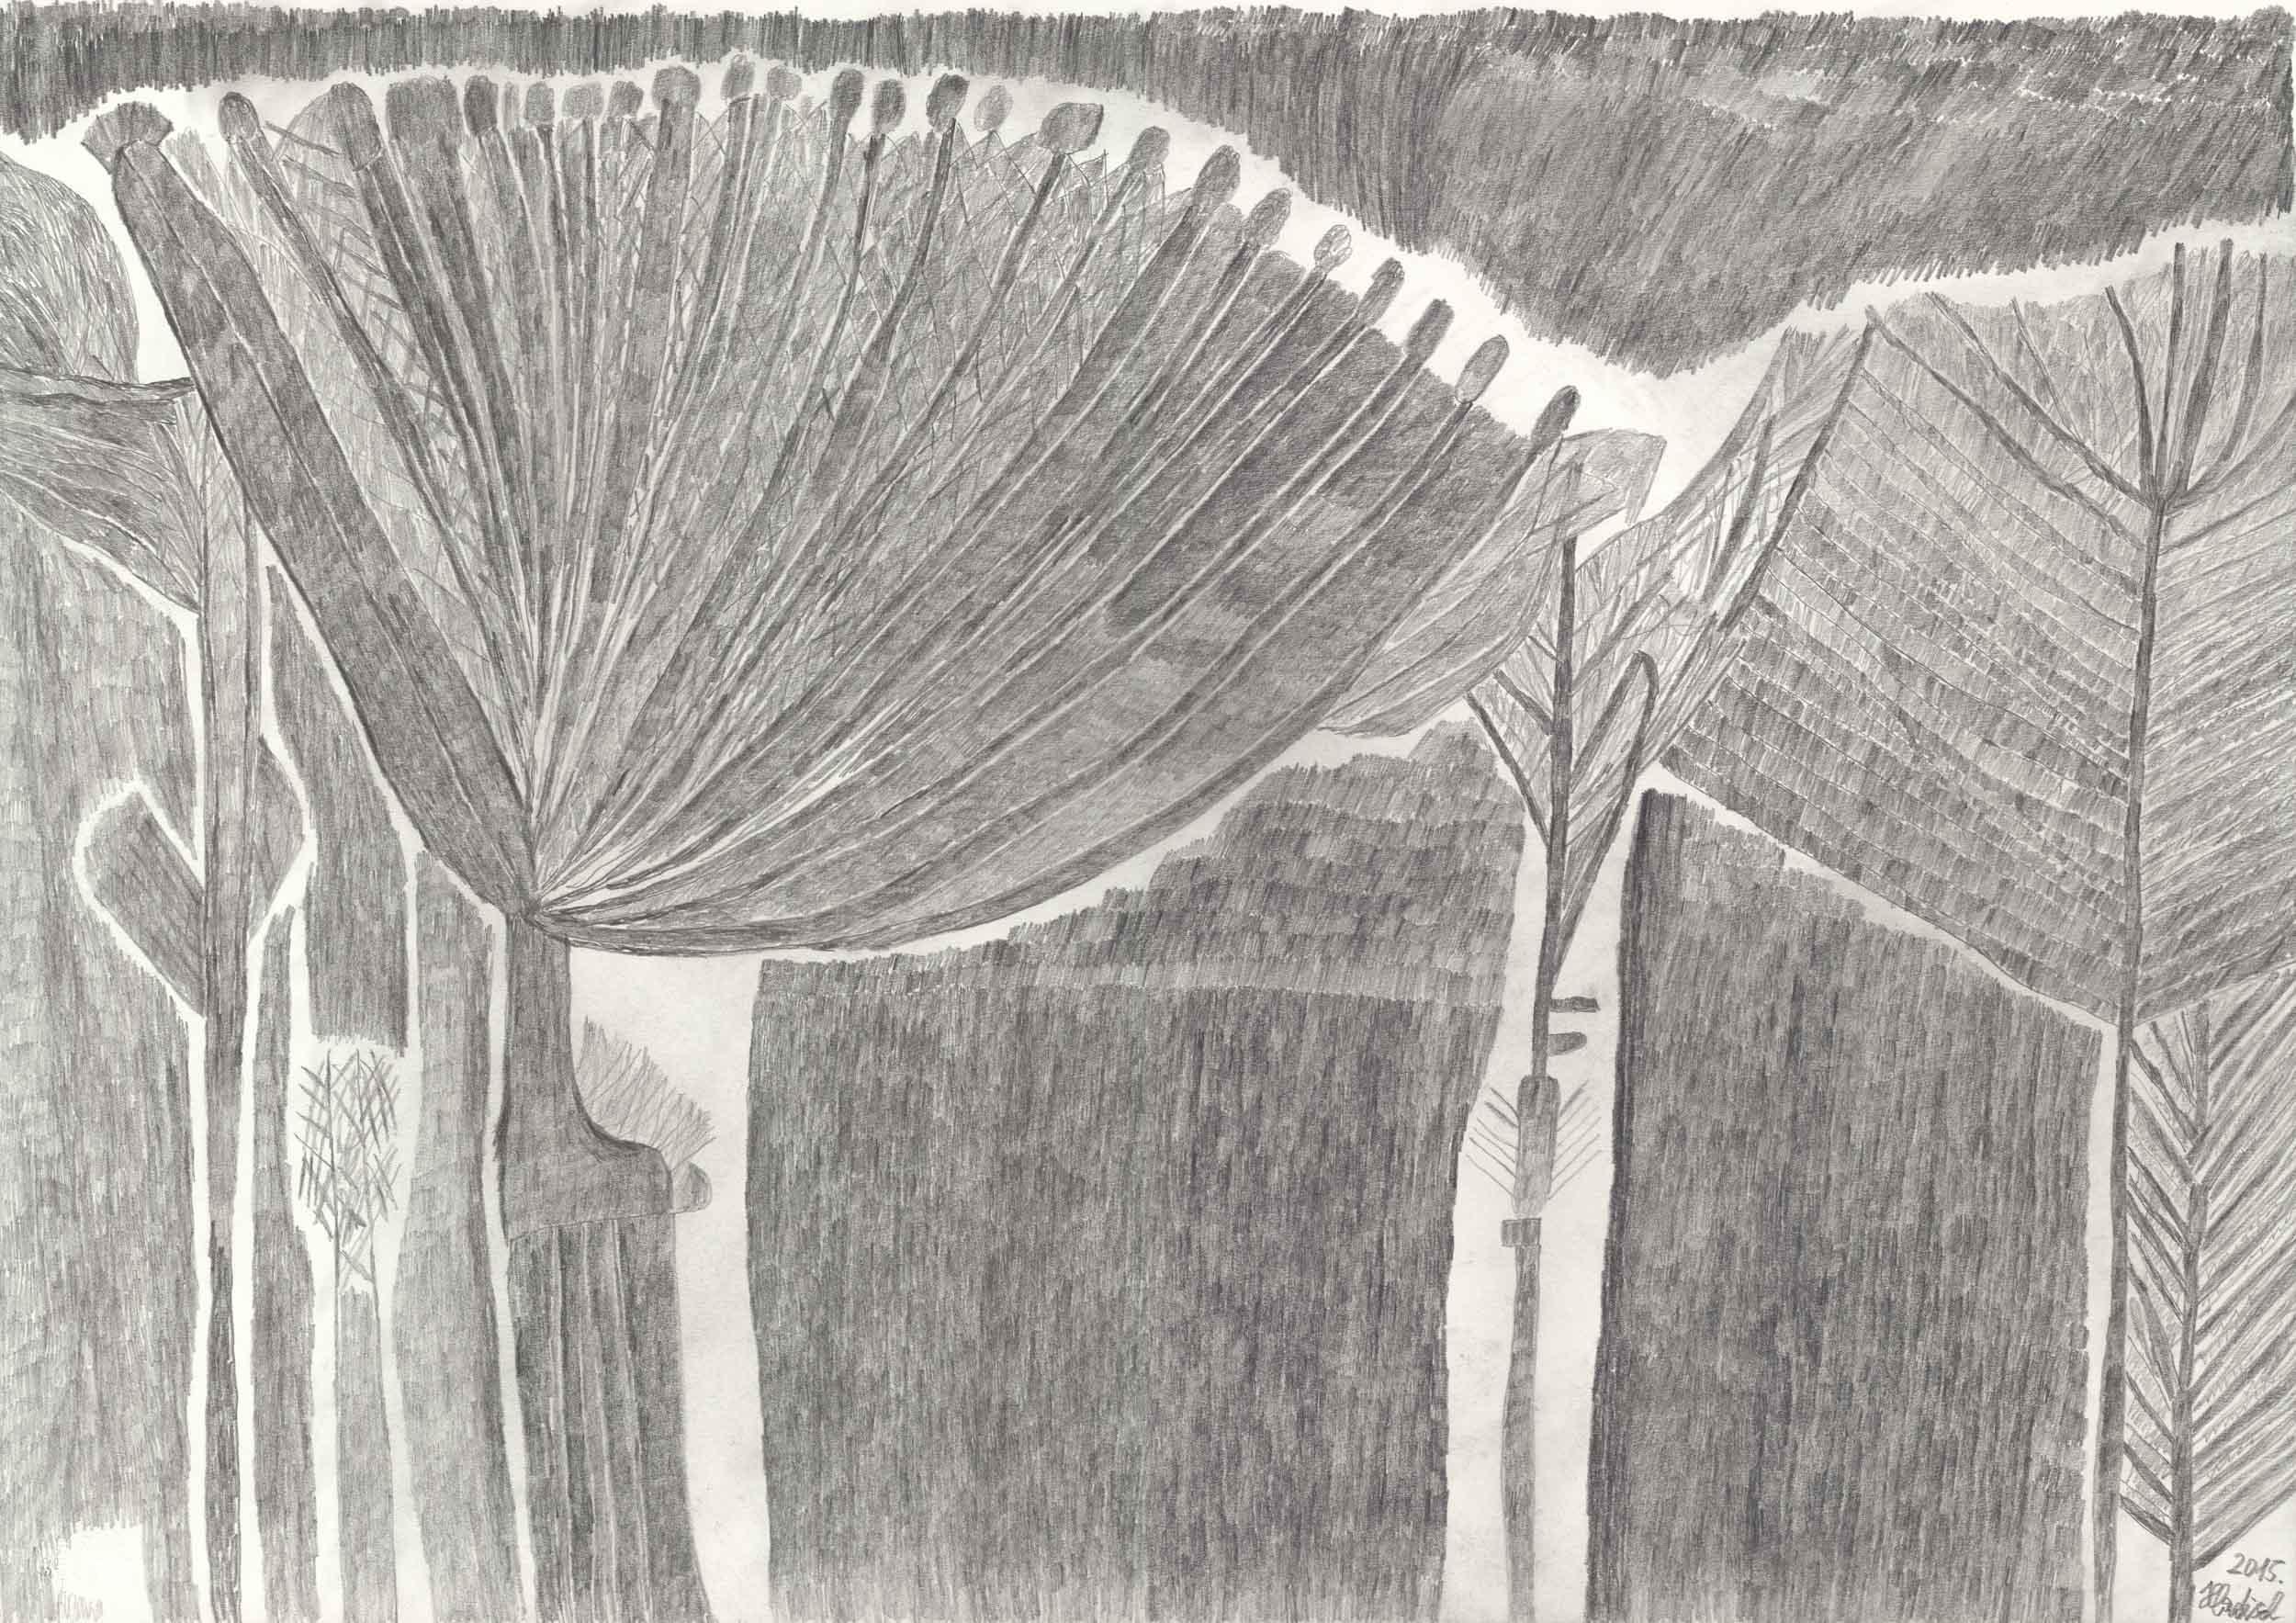 hladisch helmut - Bäume / Trees